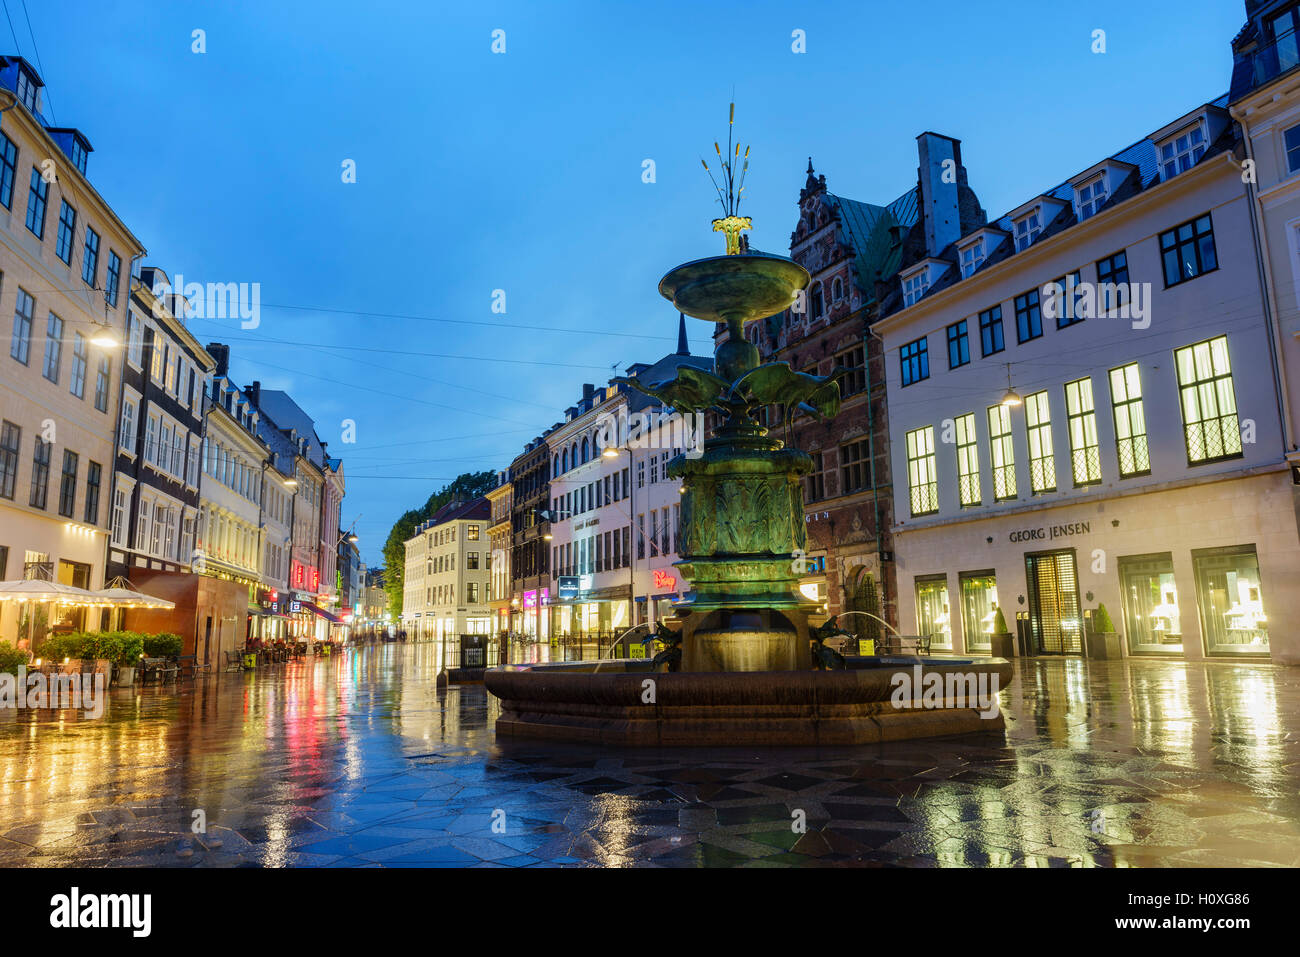 Copenhagen, AUG 28: The historical Stork Fountain nightscape on AUG 28, 2016 at Copenhagen, Denmark - Stock Image